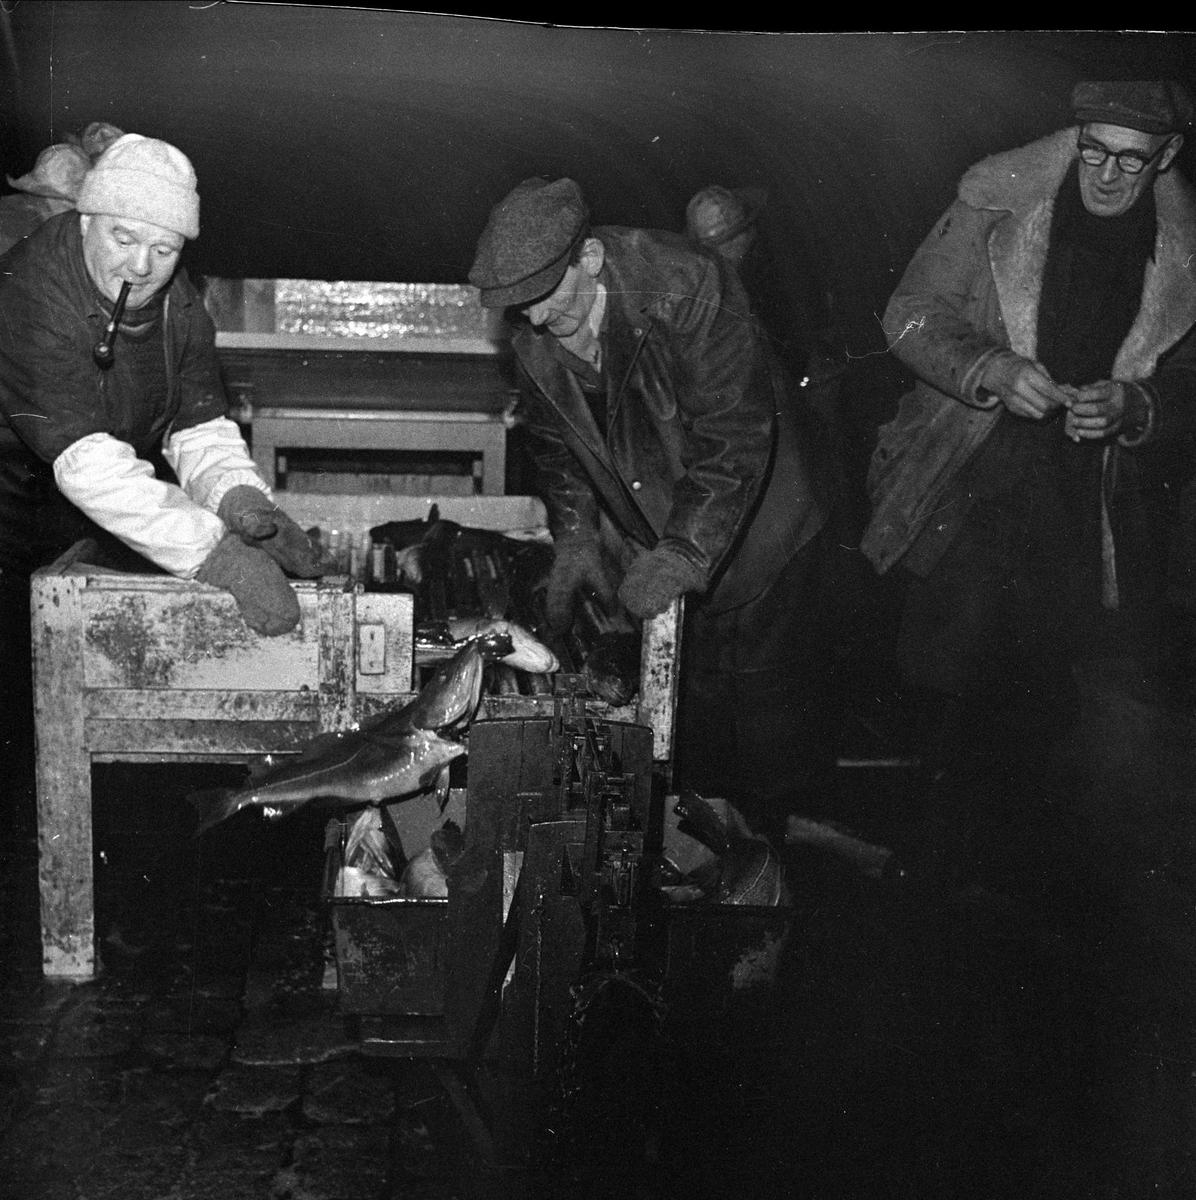 Juletorsken kommer til Oslo, 24.12.1956